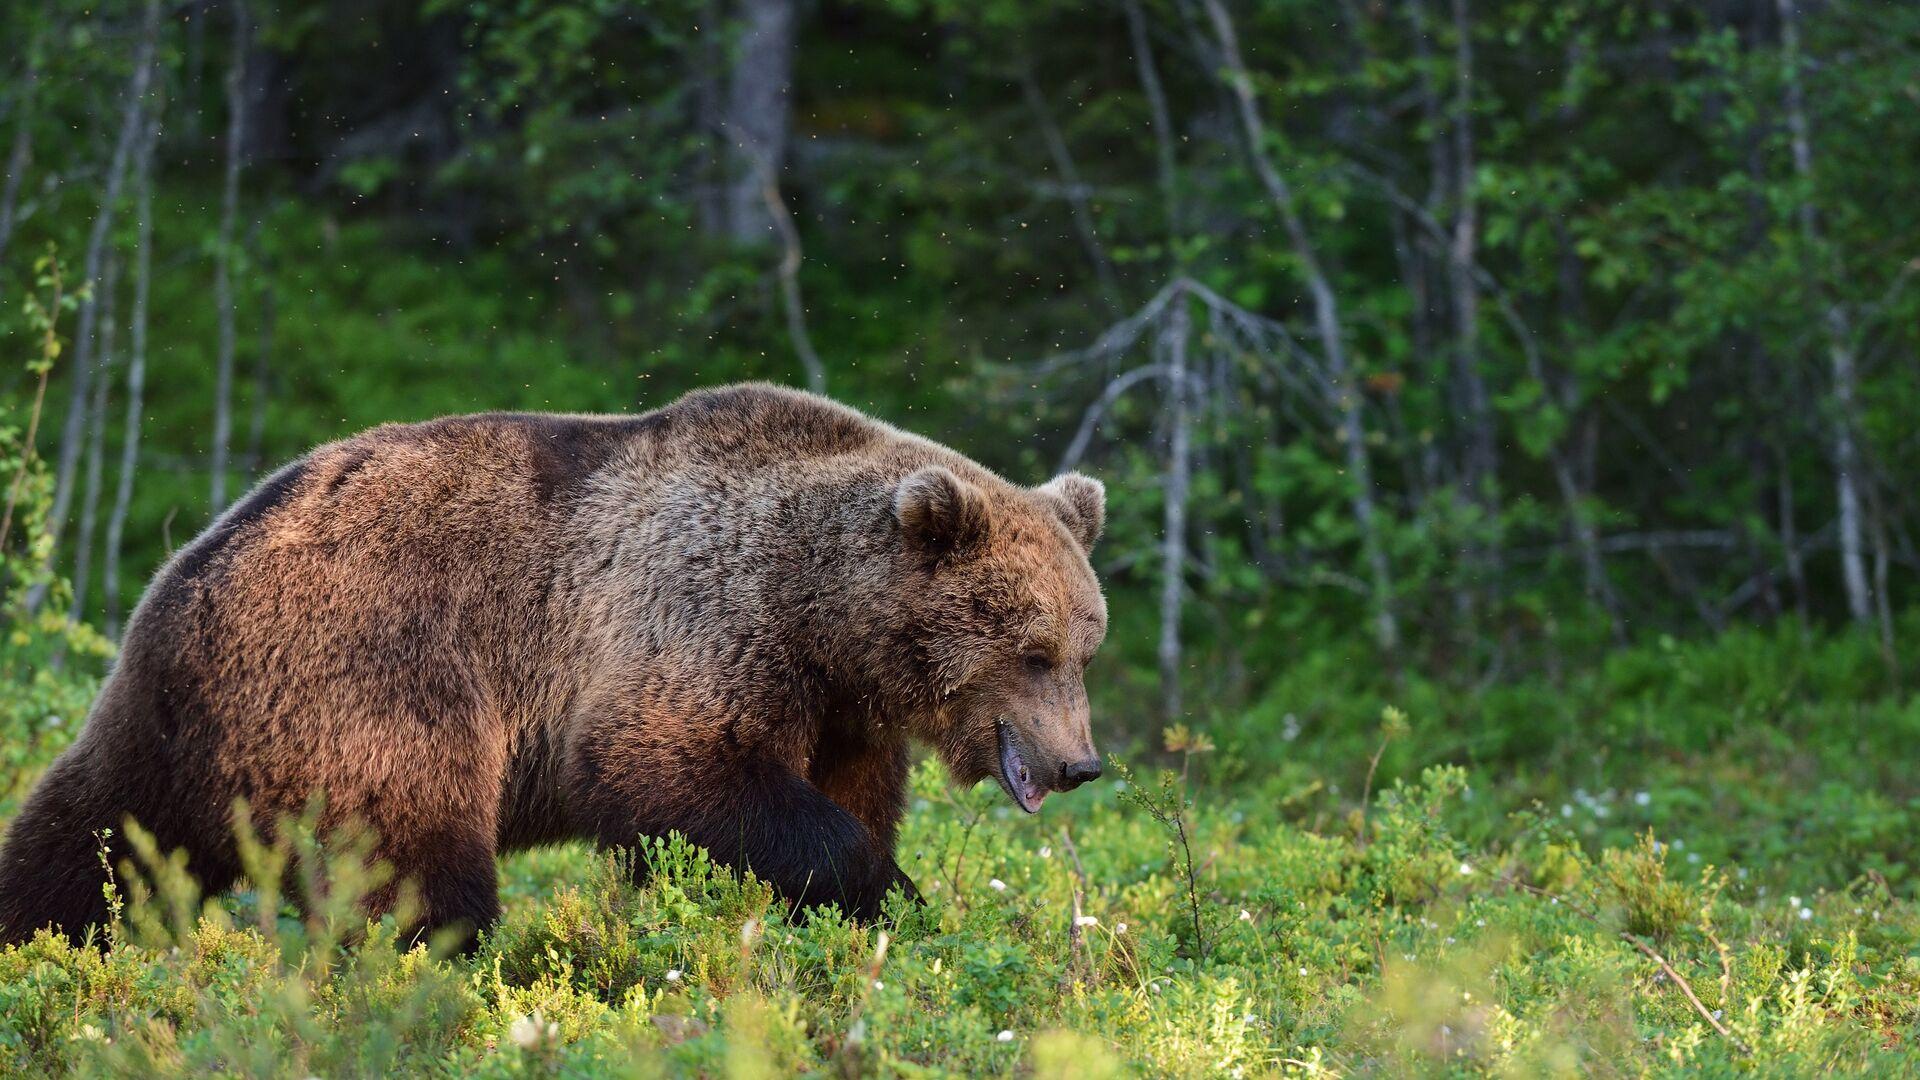 Бурый медведь - РИА Новости, 1920, 22.06.2021